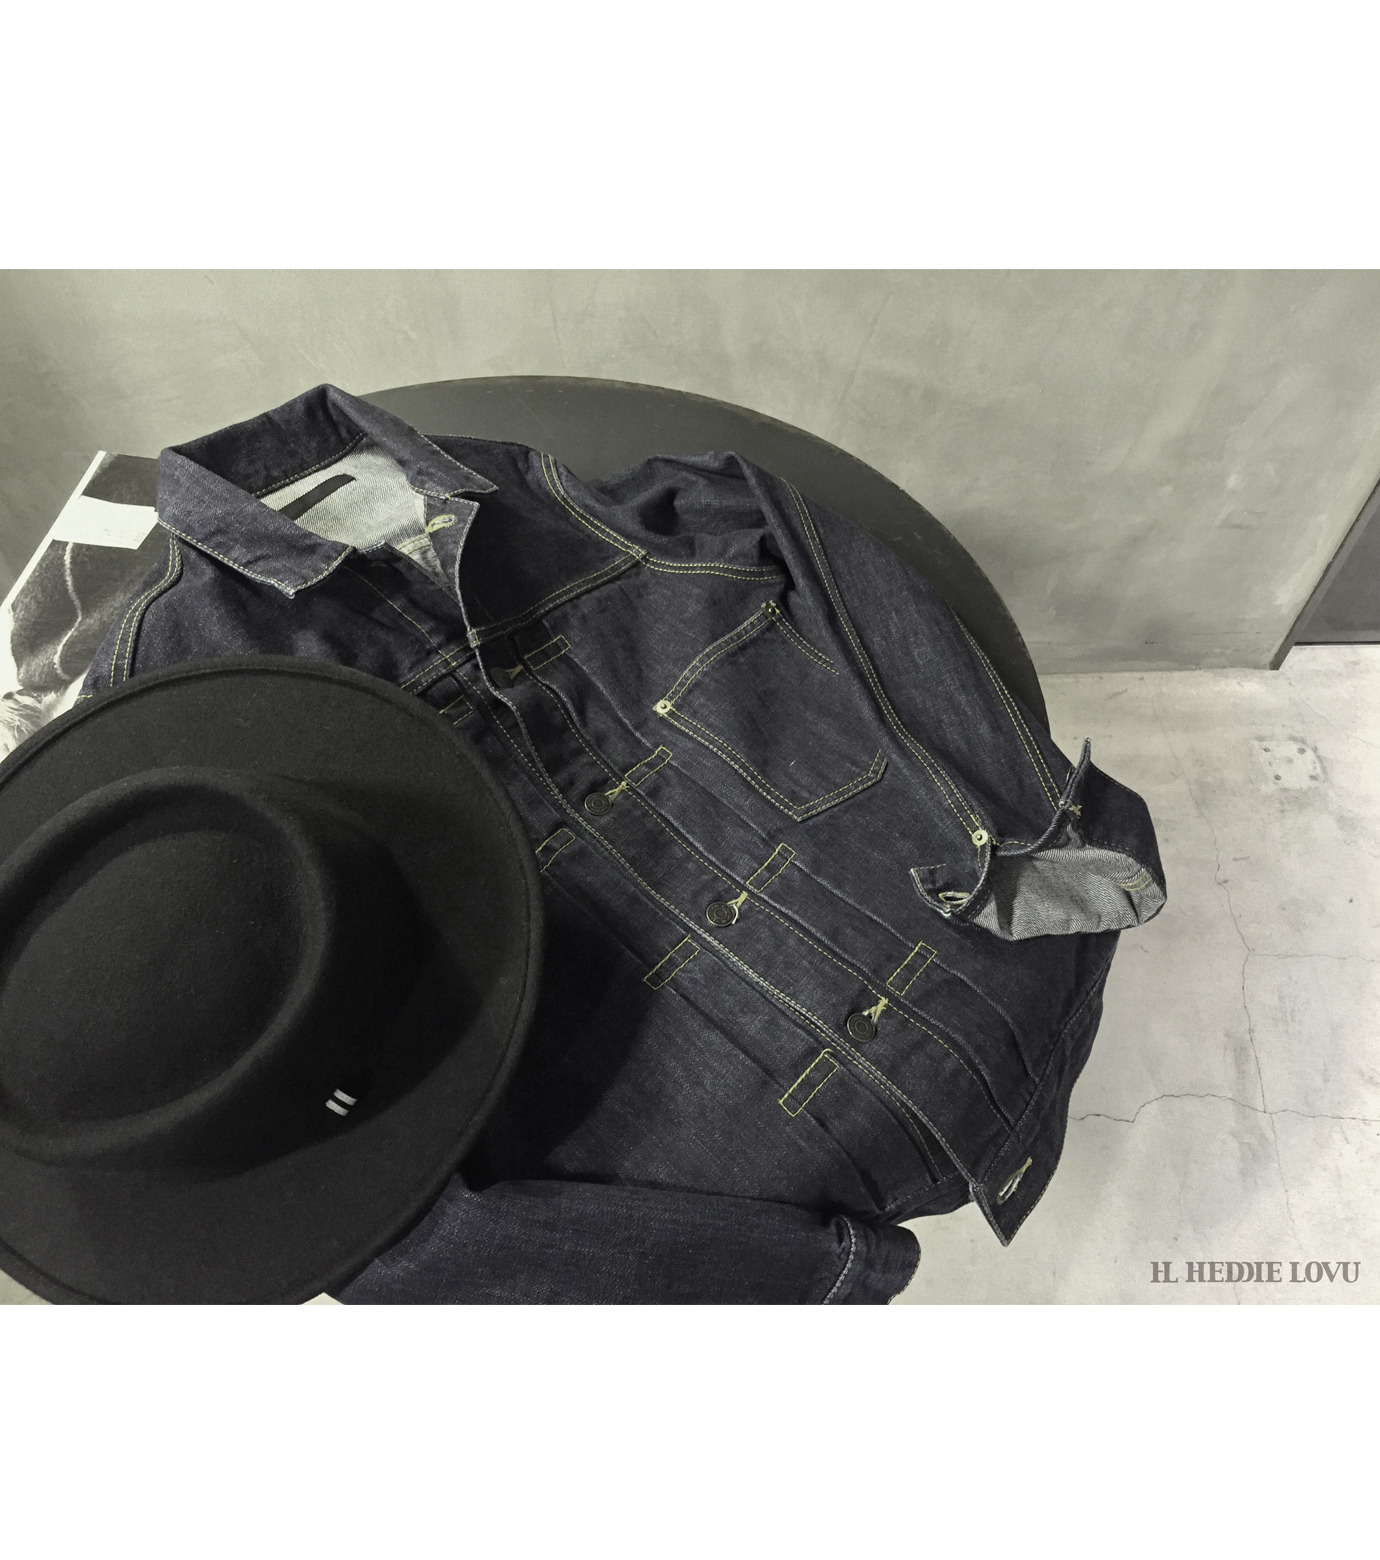 HL HEDDIE LOVU(エイチエル・エディールーヴ)のINDIGO DENIM JACKET-INDIGO(ジャケット/jacket)-17A94002-94 拡大詳細画像10